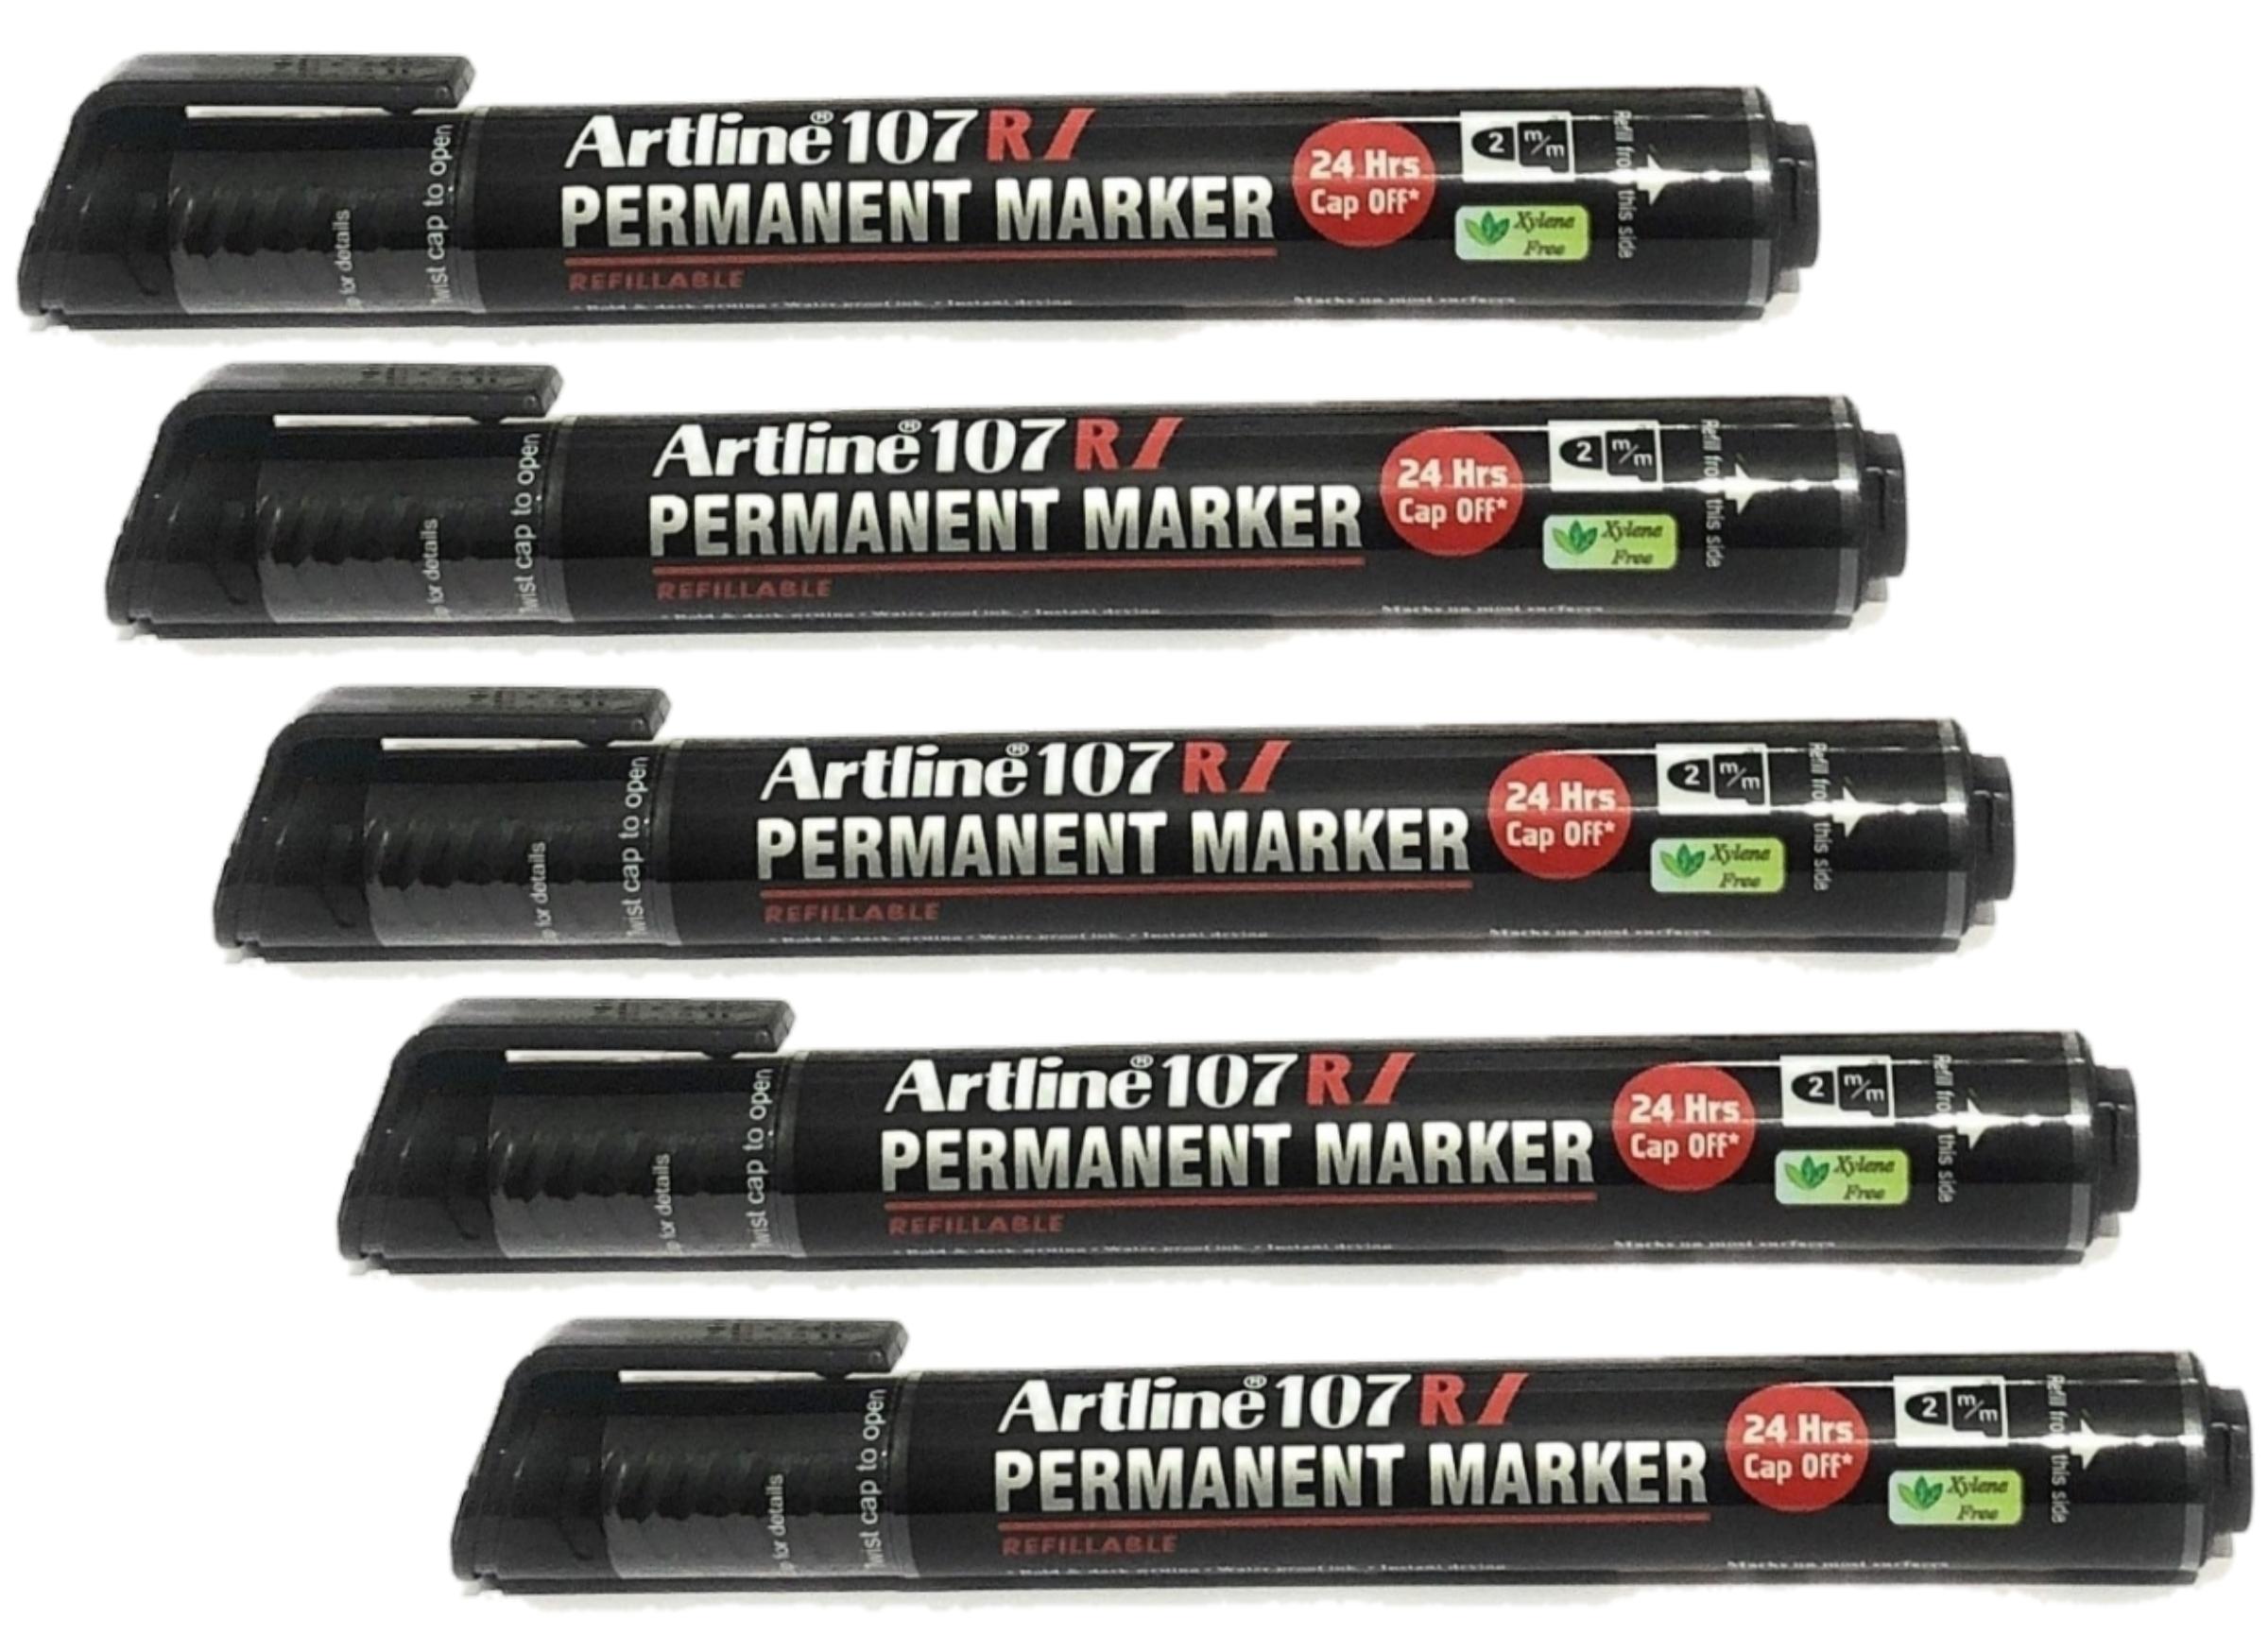 Artline Permanent Marker 107 RI Black Refillable Pack of 5 Marker